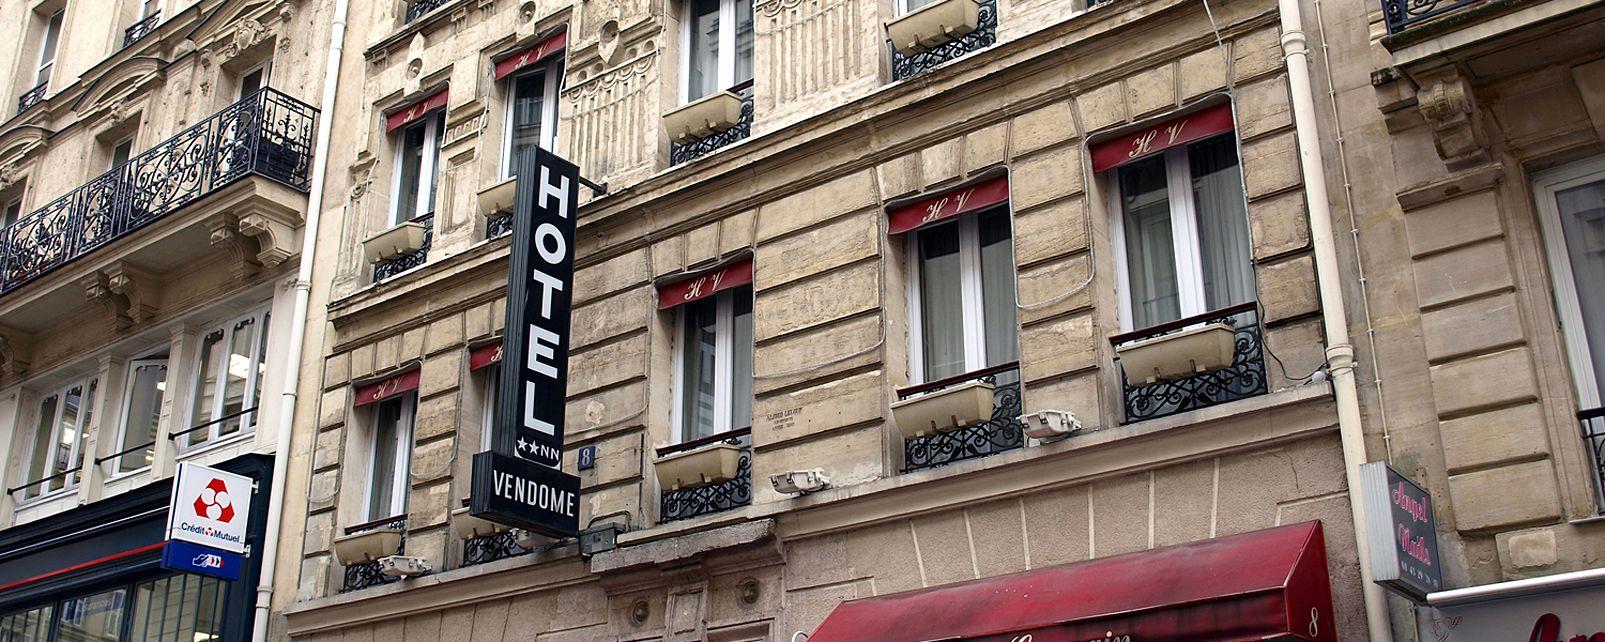 Hotel Vendome St Germain